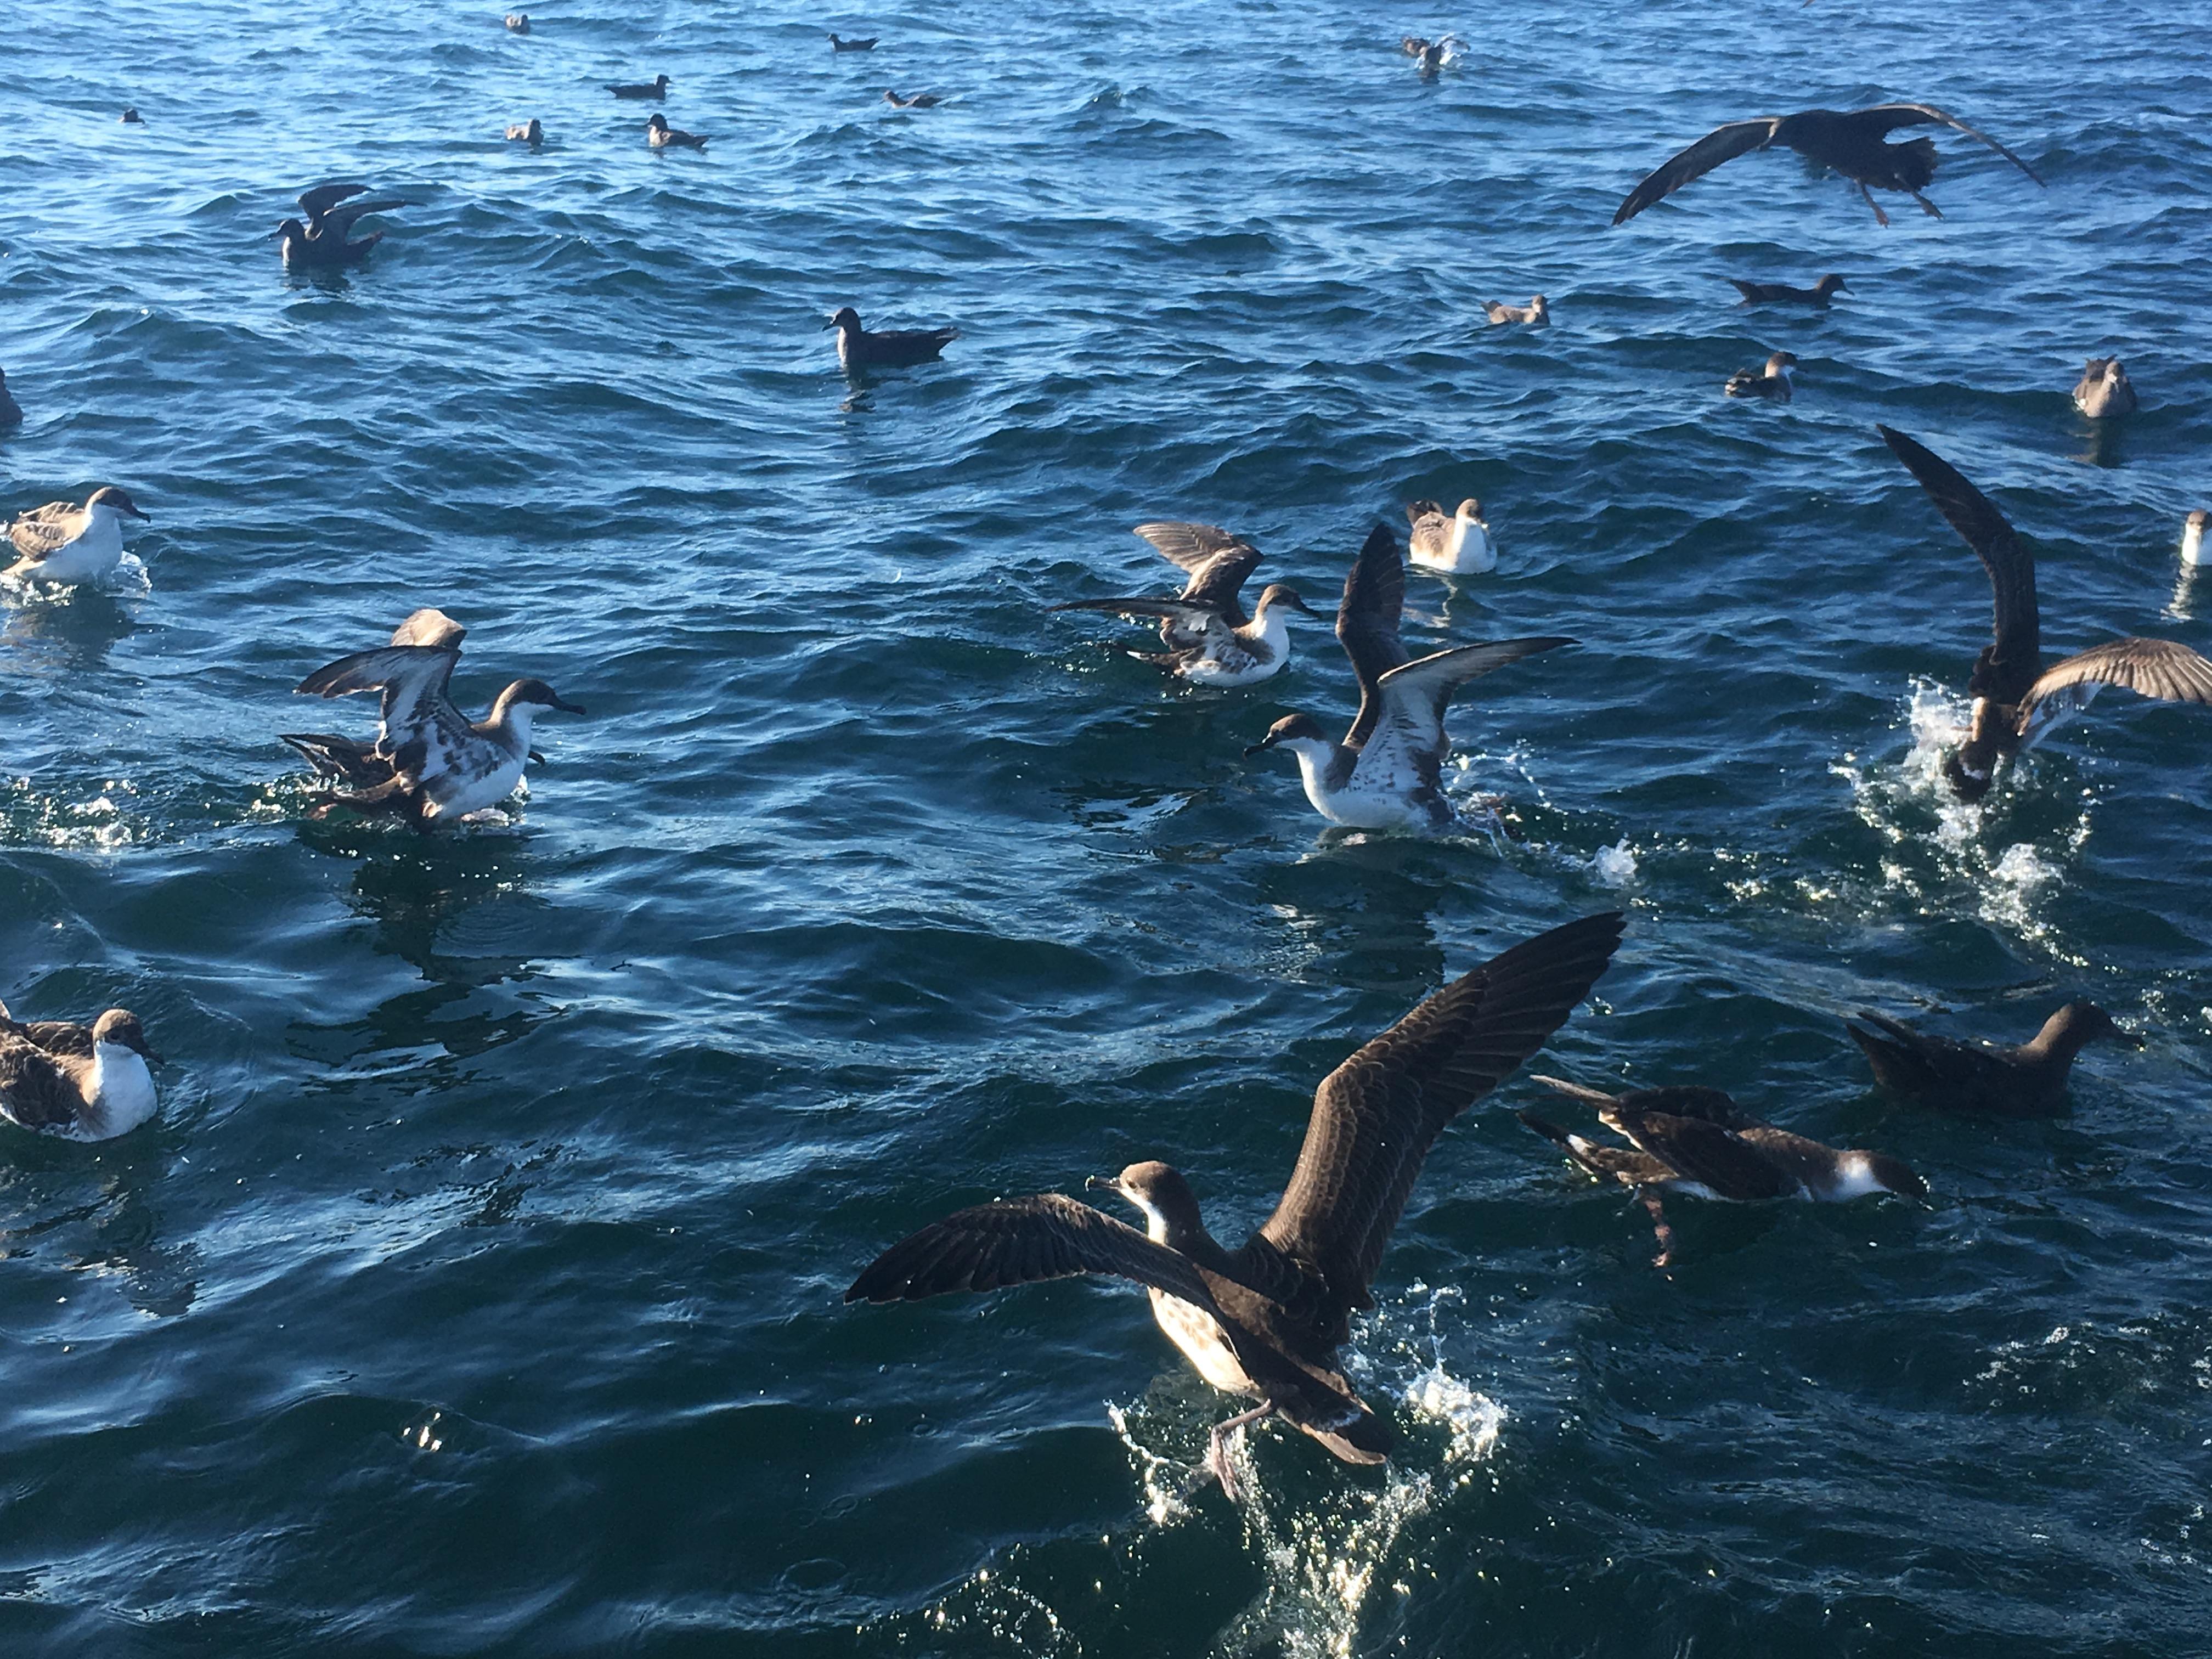 Seabird tagging 101